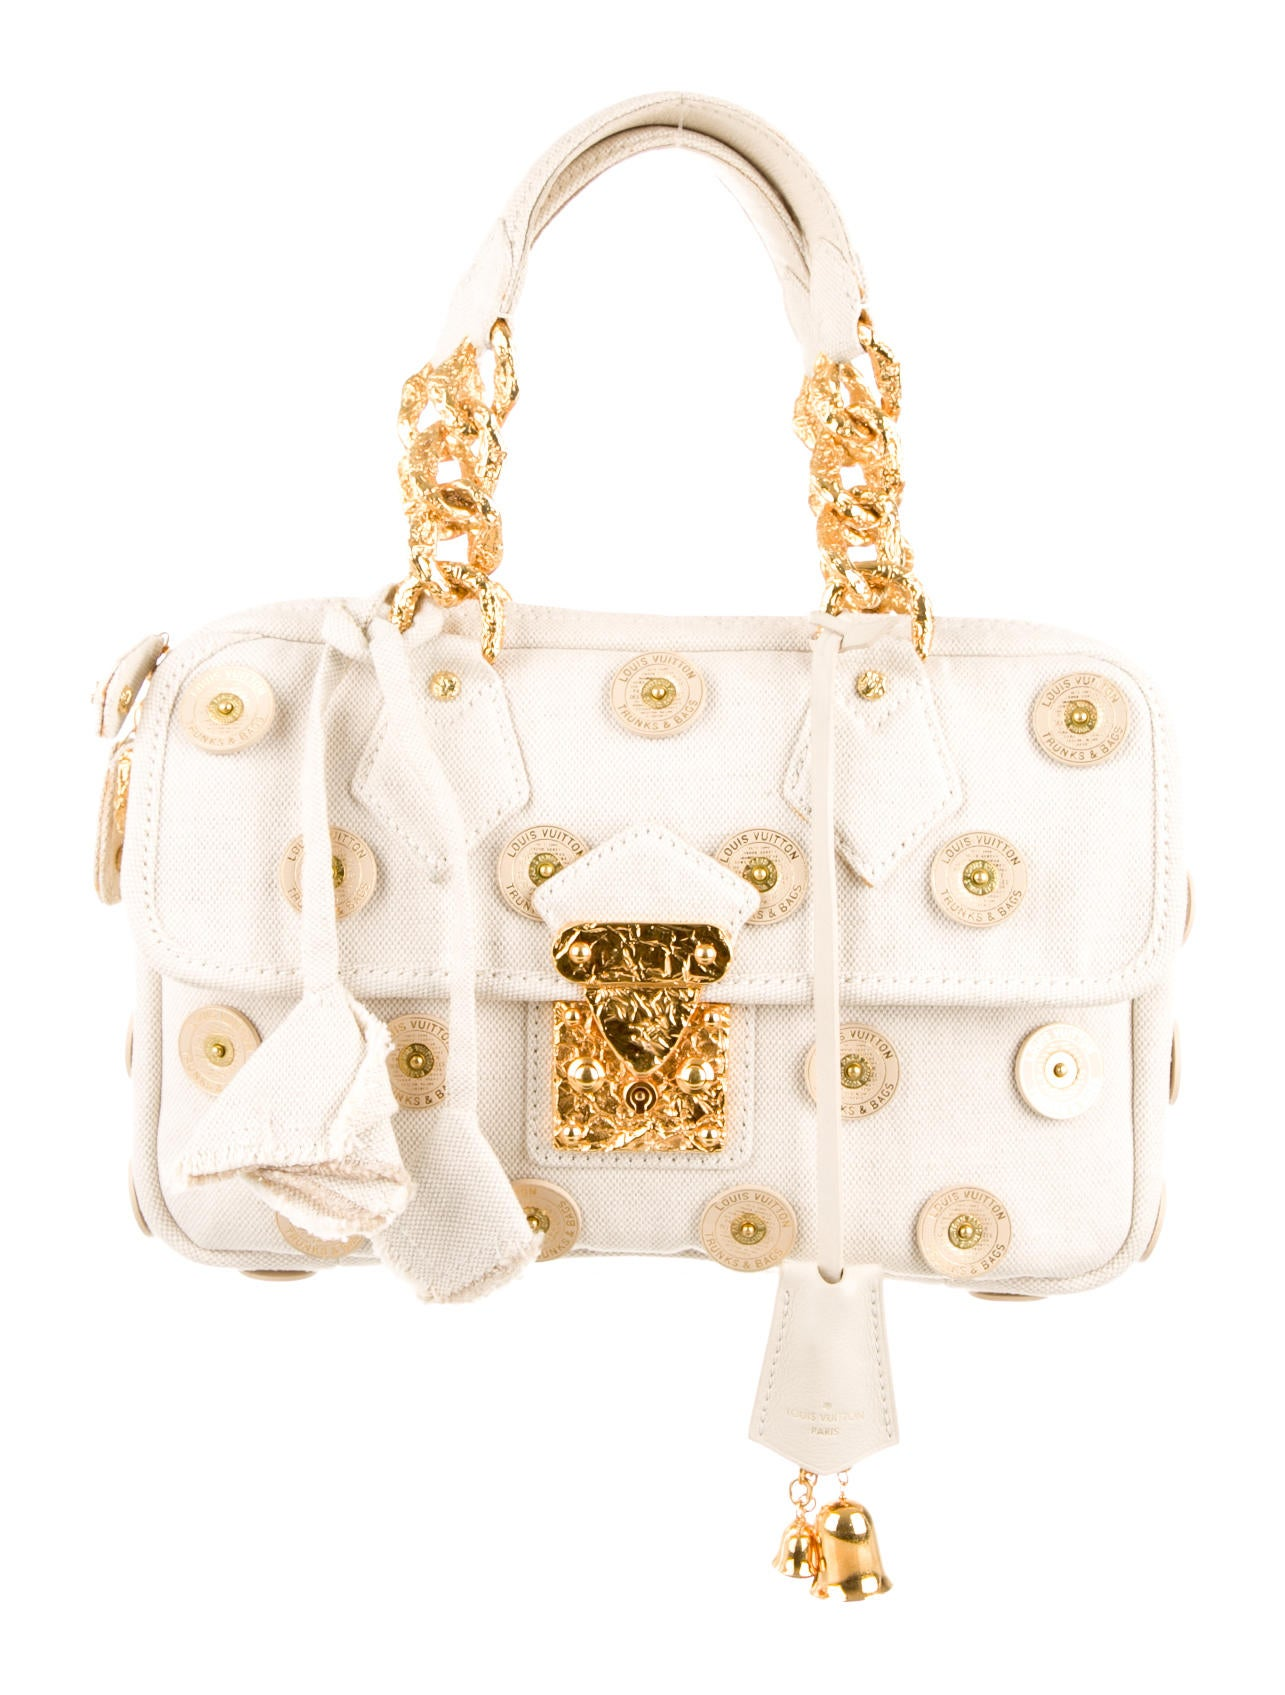 Louis Vuitton Polka Dots Panema Tinkerbell Bag - Handbags